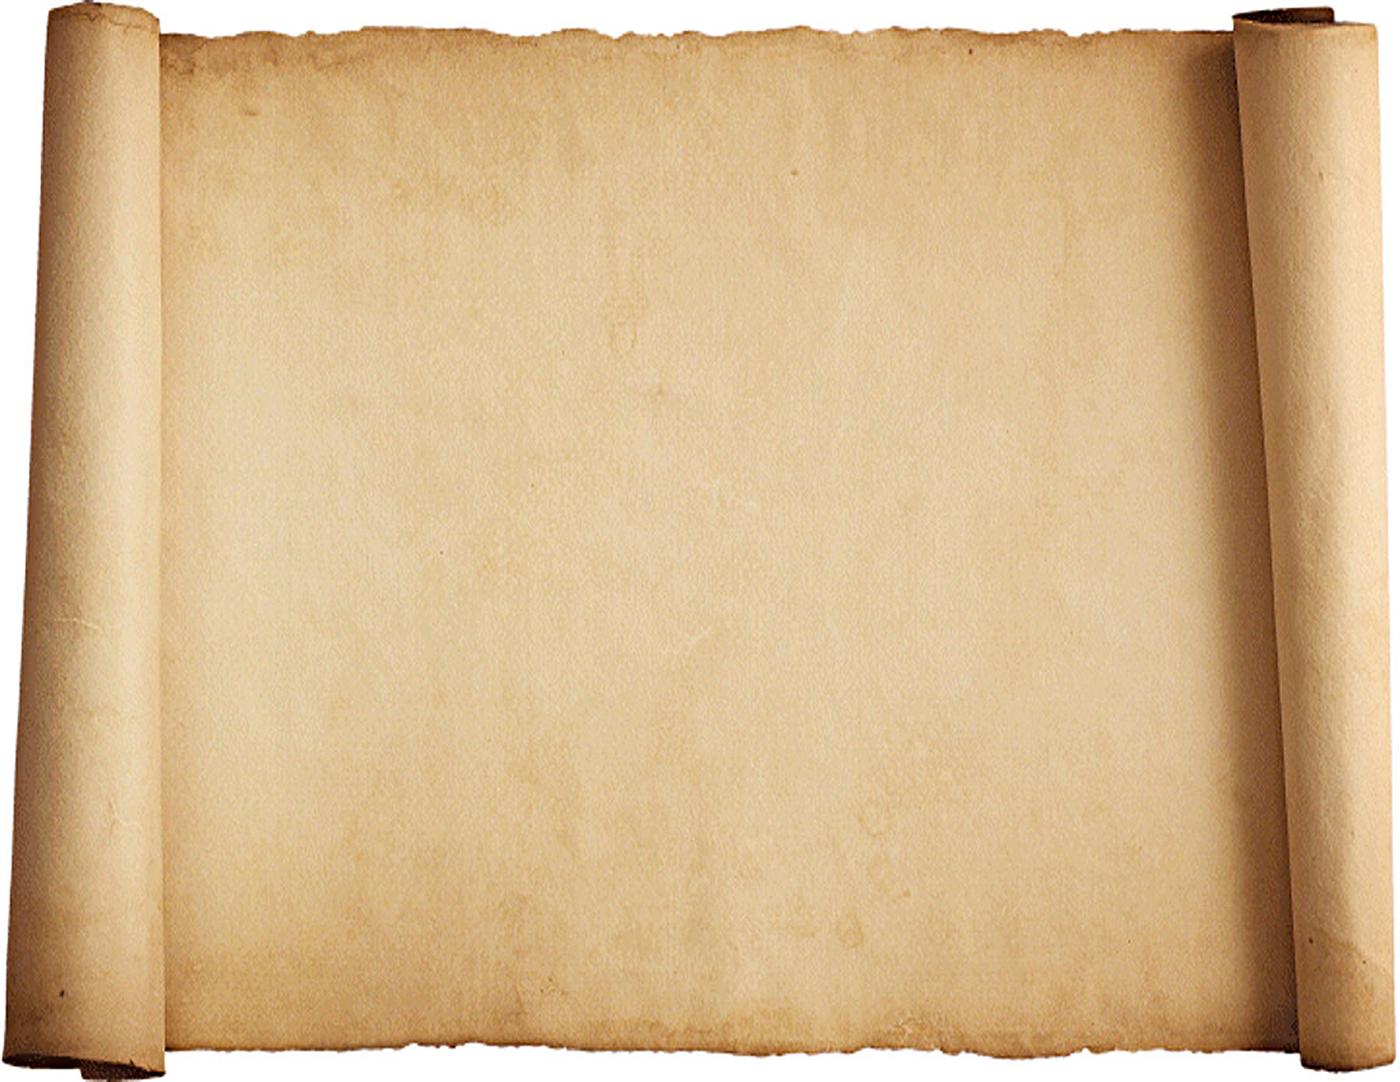 Displaying 16 images for parchment scroll png final displaying 16 images for parchment scroll png parchment backgroundadventure islandppt toneelgroepblik Choice Image